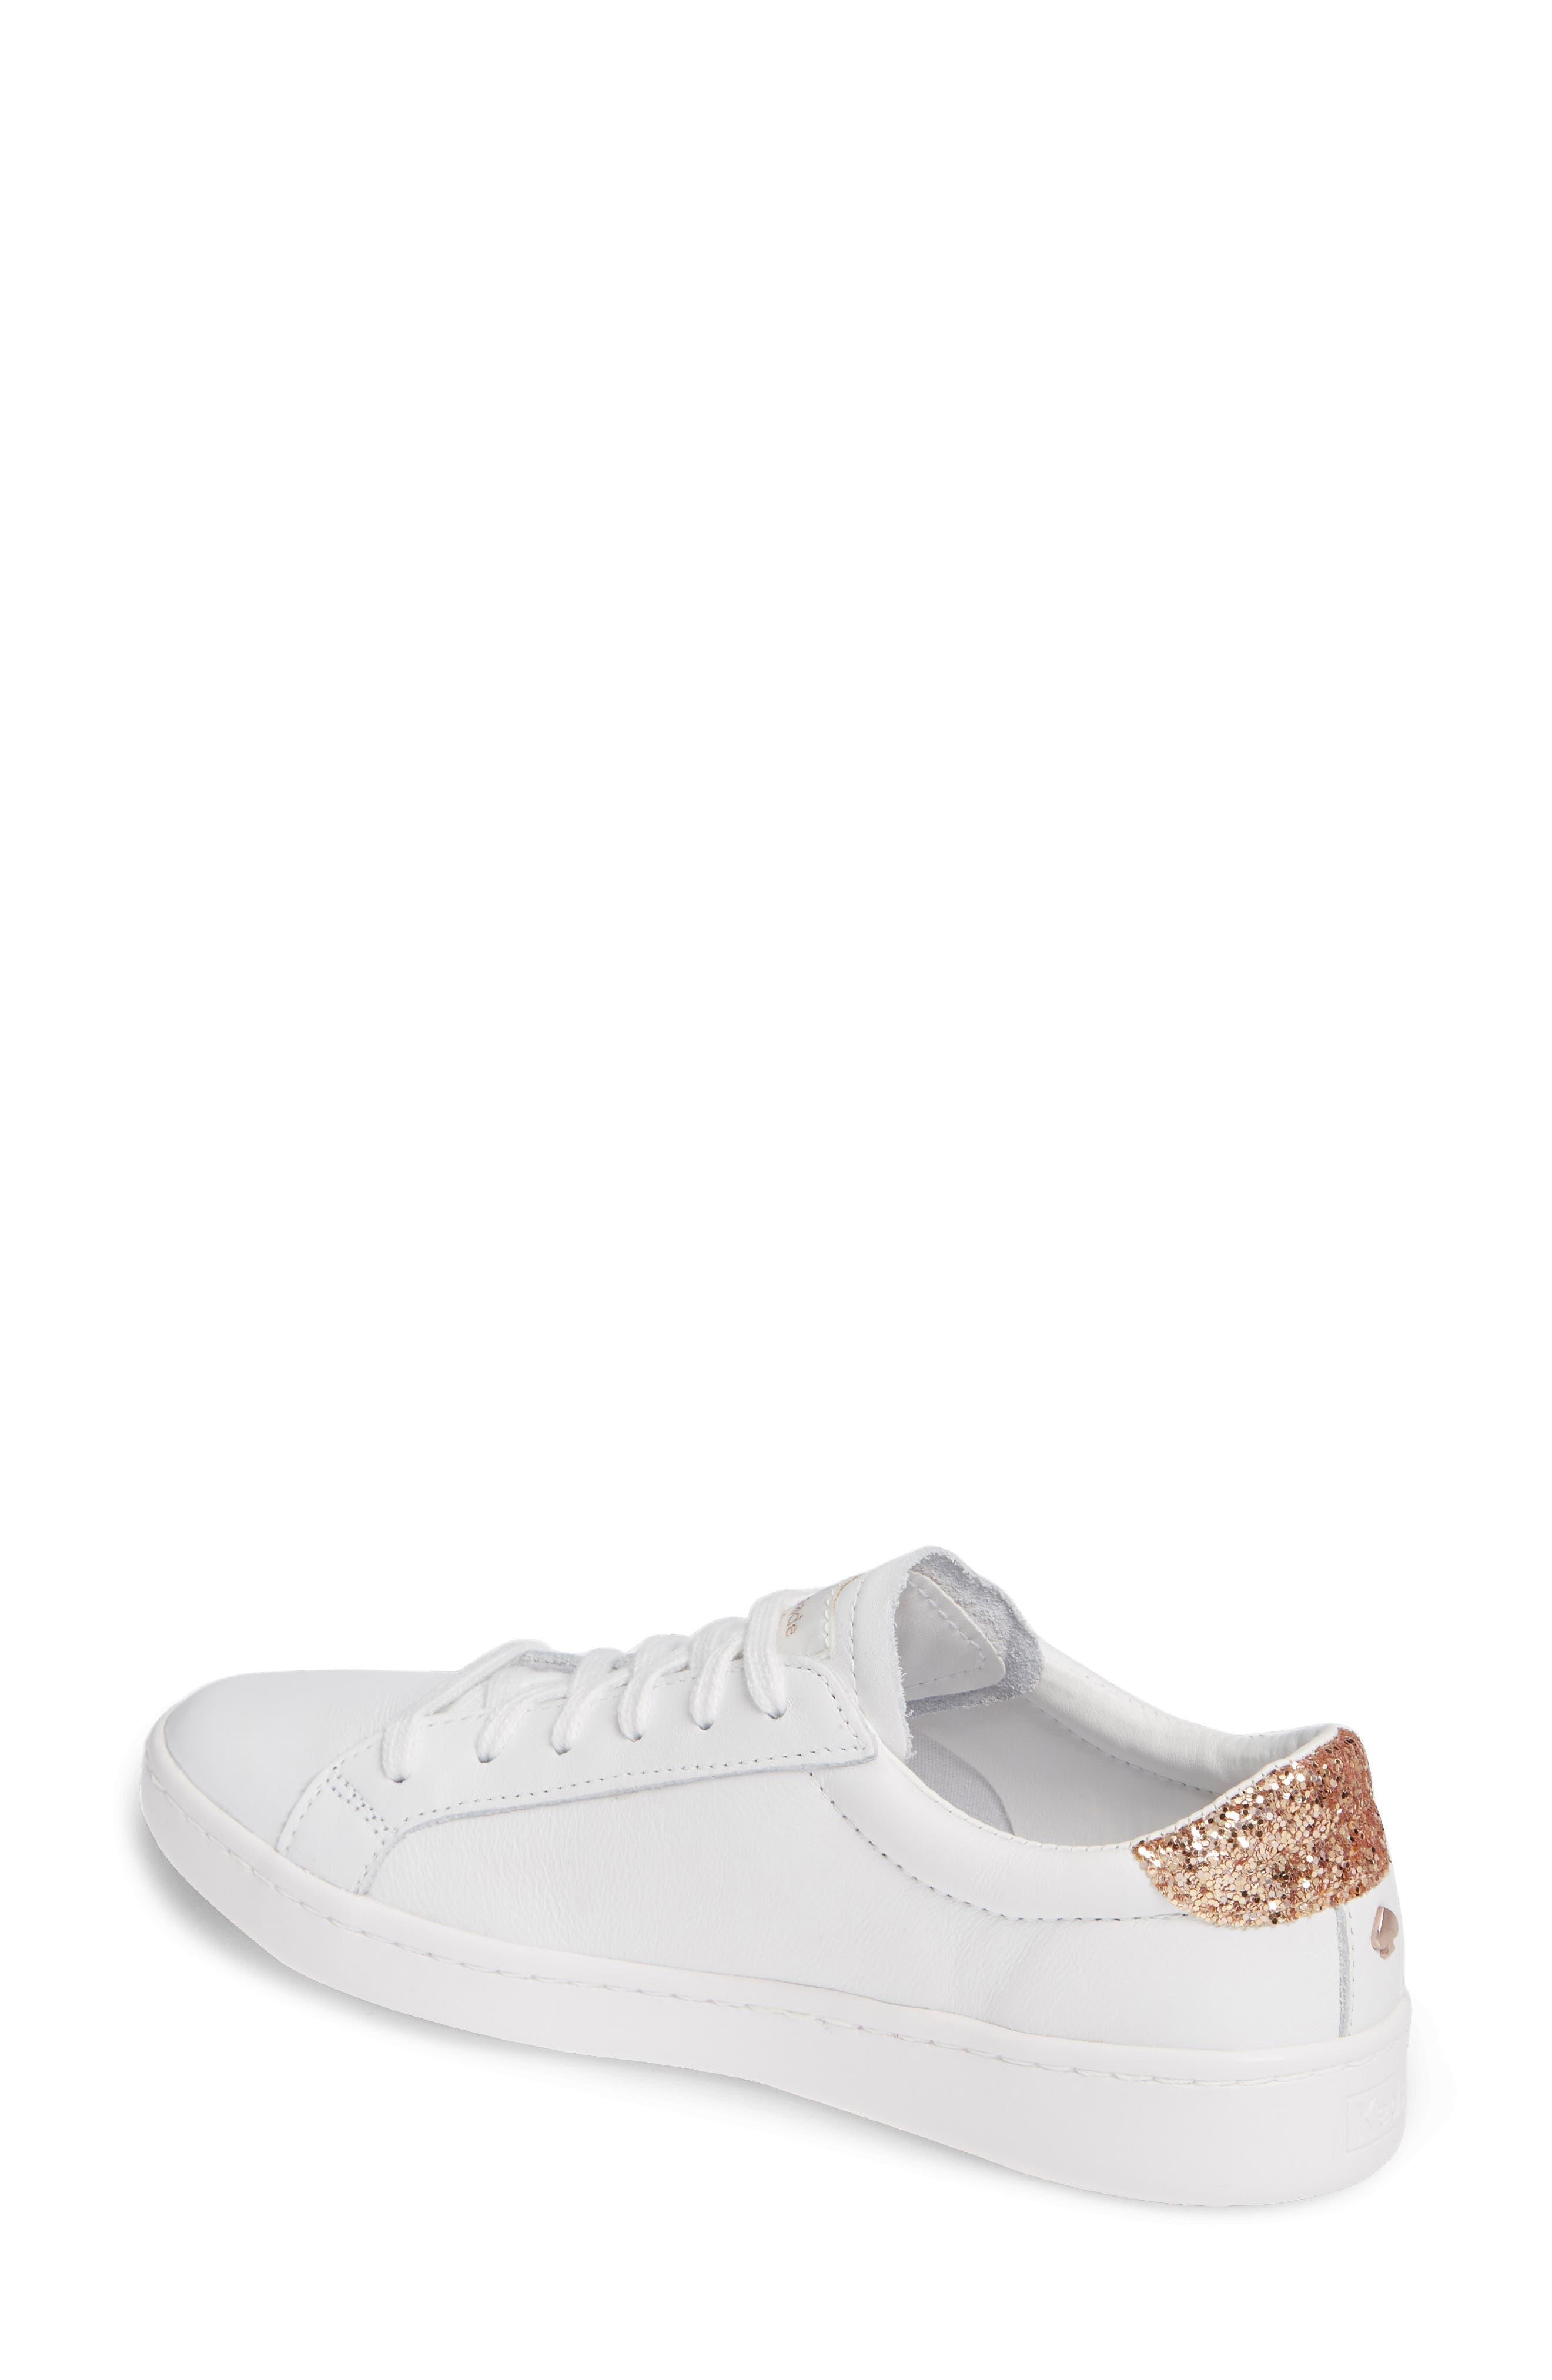 KEDS<SUP>®</SUP> FOR KATE SPADE NEW YORK, ace glitter sneaker, Alternate thumbnail 2, color, 100